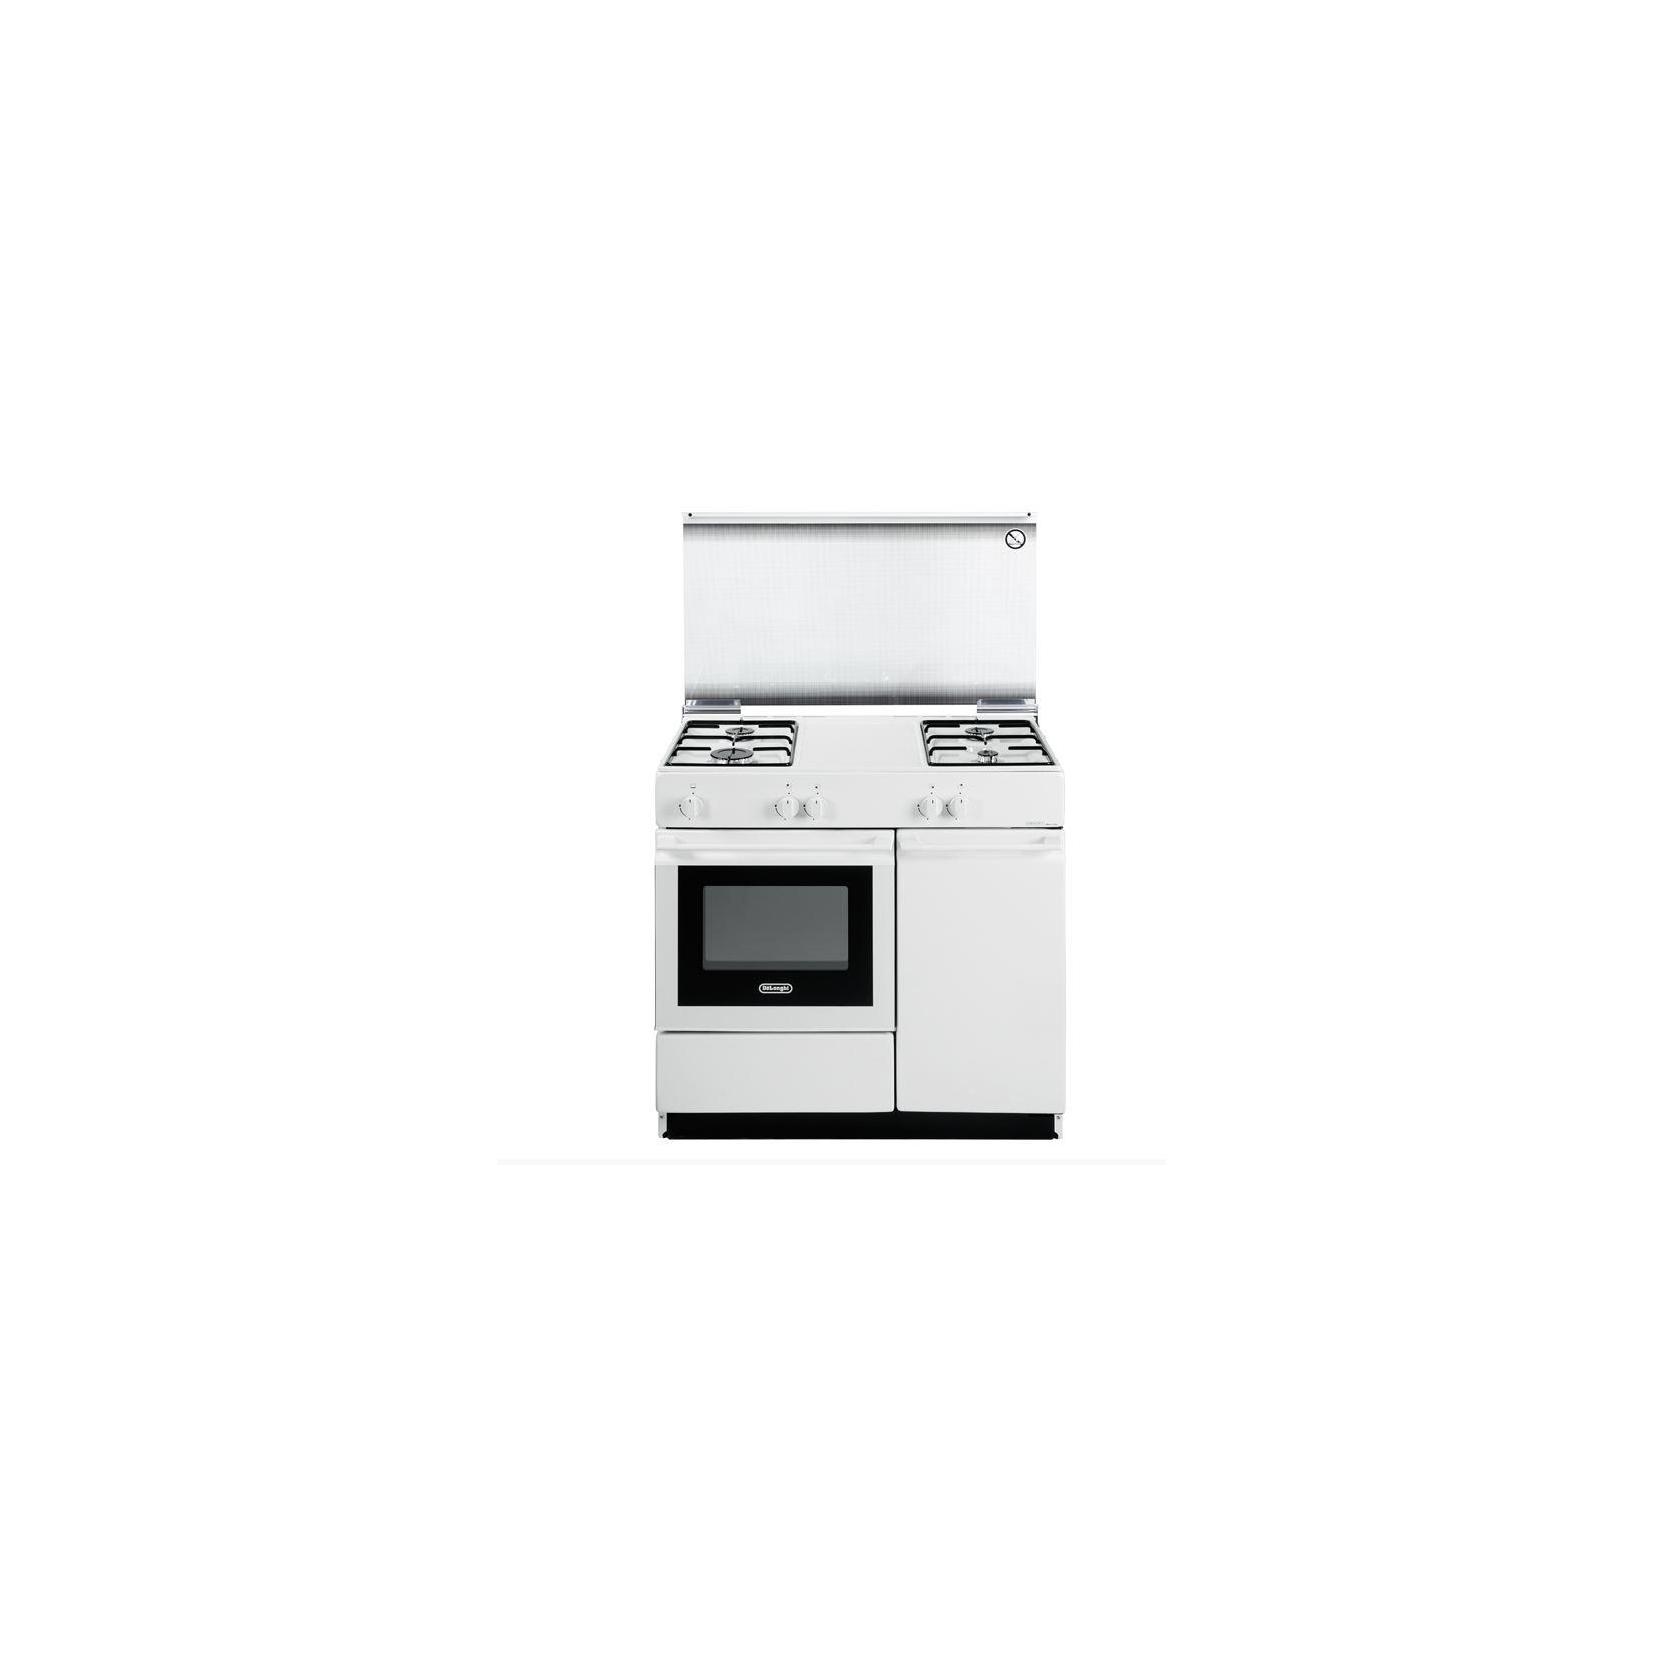 Cucina de longhi sgw854n bianca 86x50 4 fuochi forno gas term coperchio in cristallo - Cucine a gas samsung ...